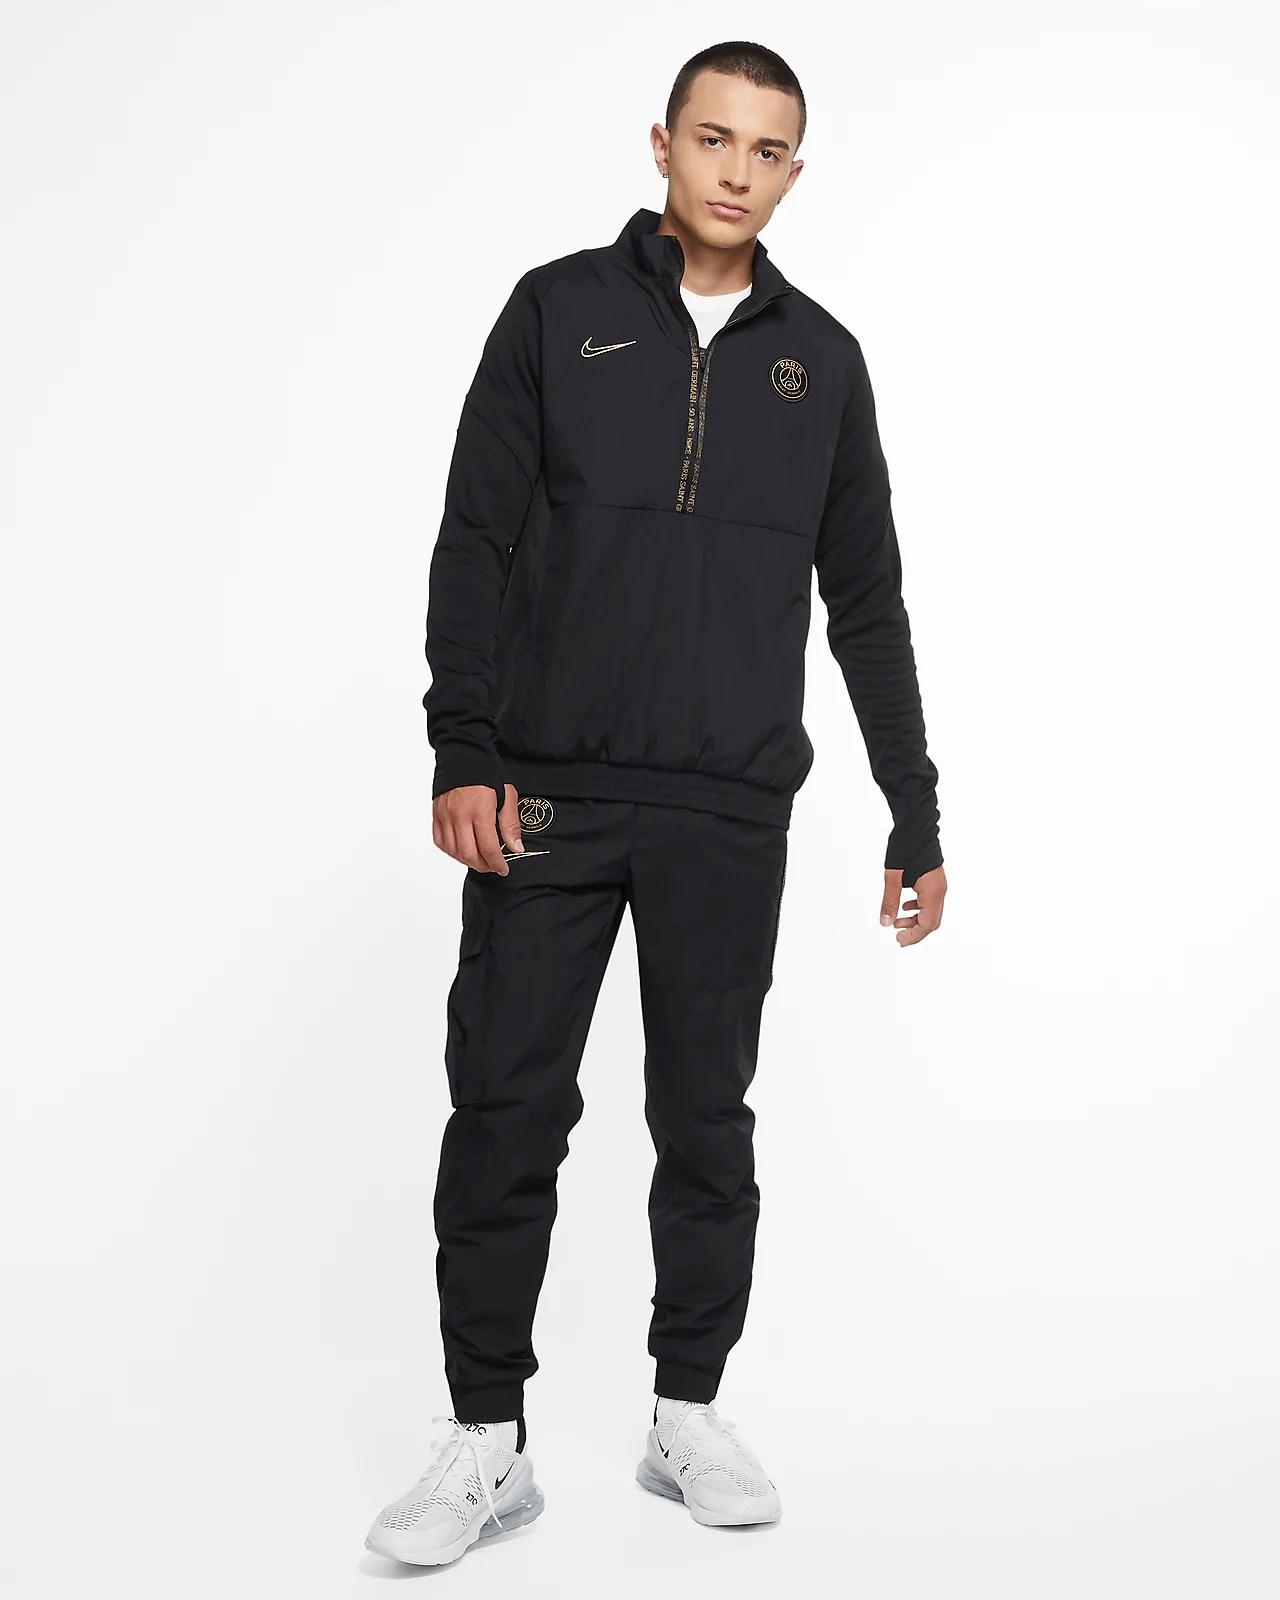 paris saint germain men s 1 2 zip woven football tracksuit jacket